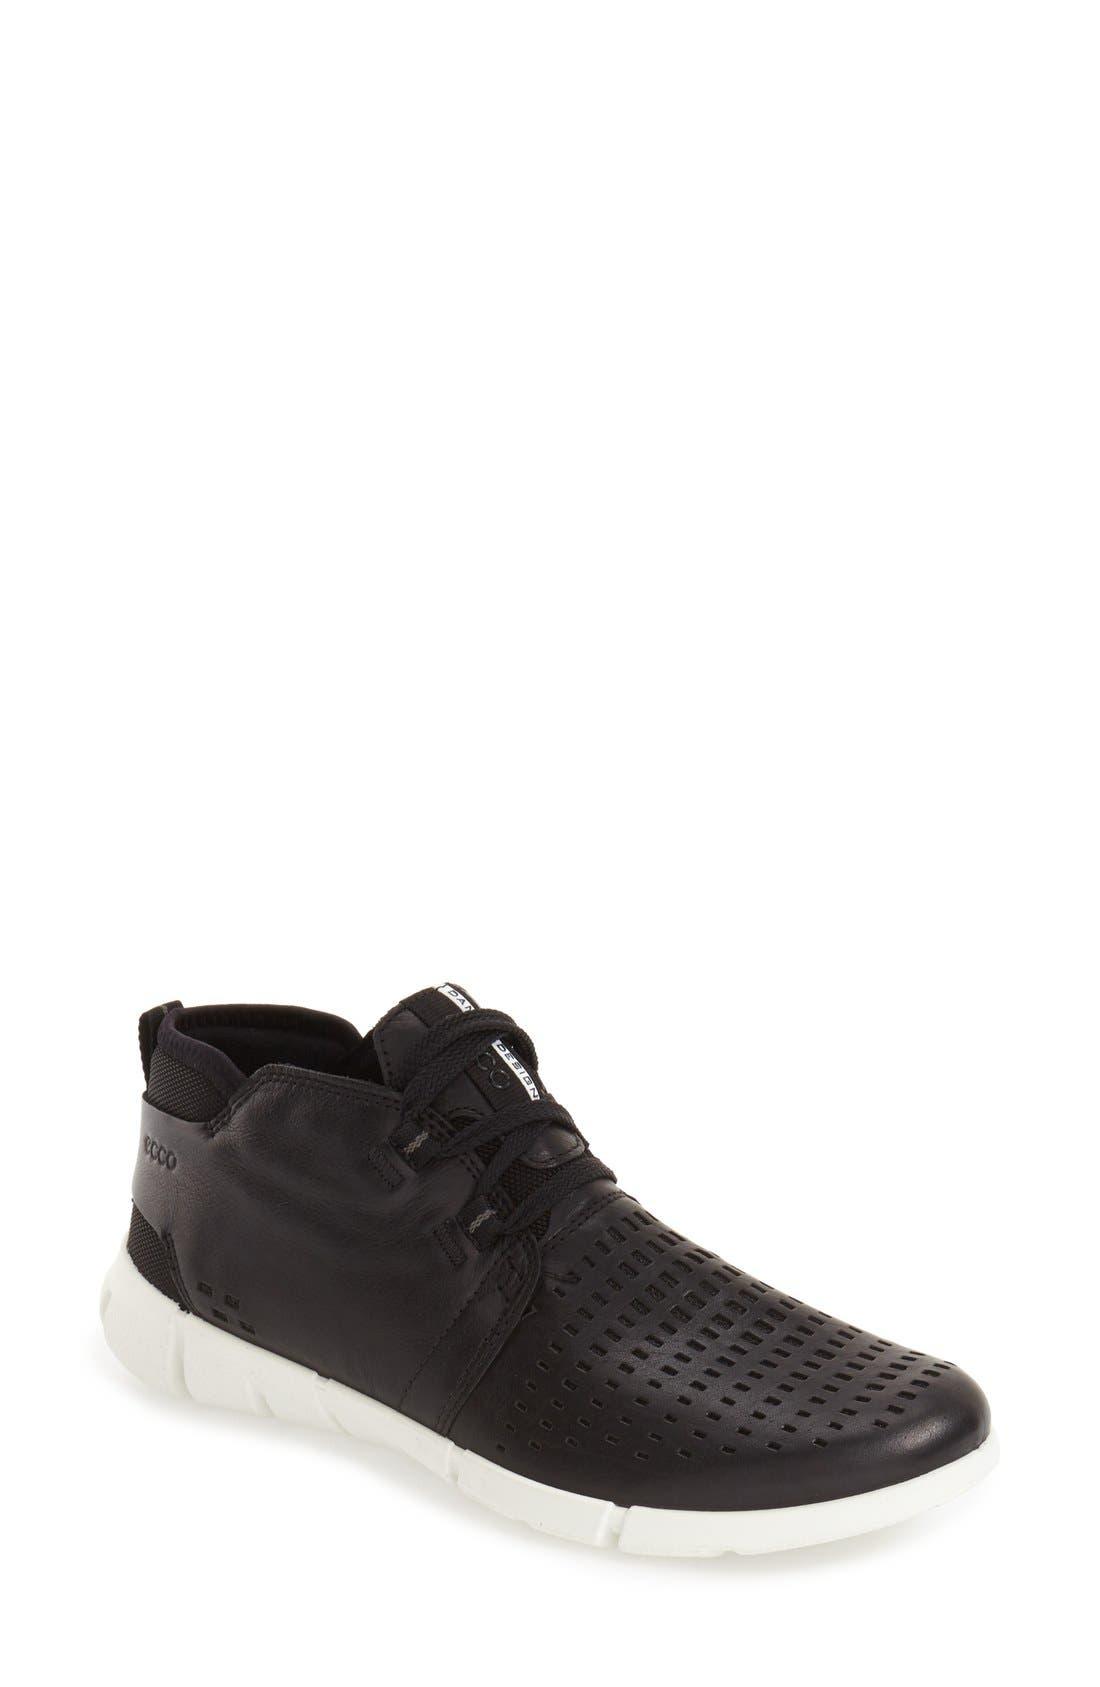 Main Image - ECCO 'Intrinsic' Chukka Sneaker (Women)